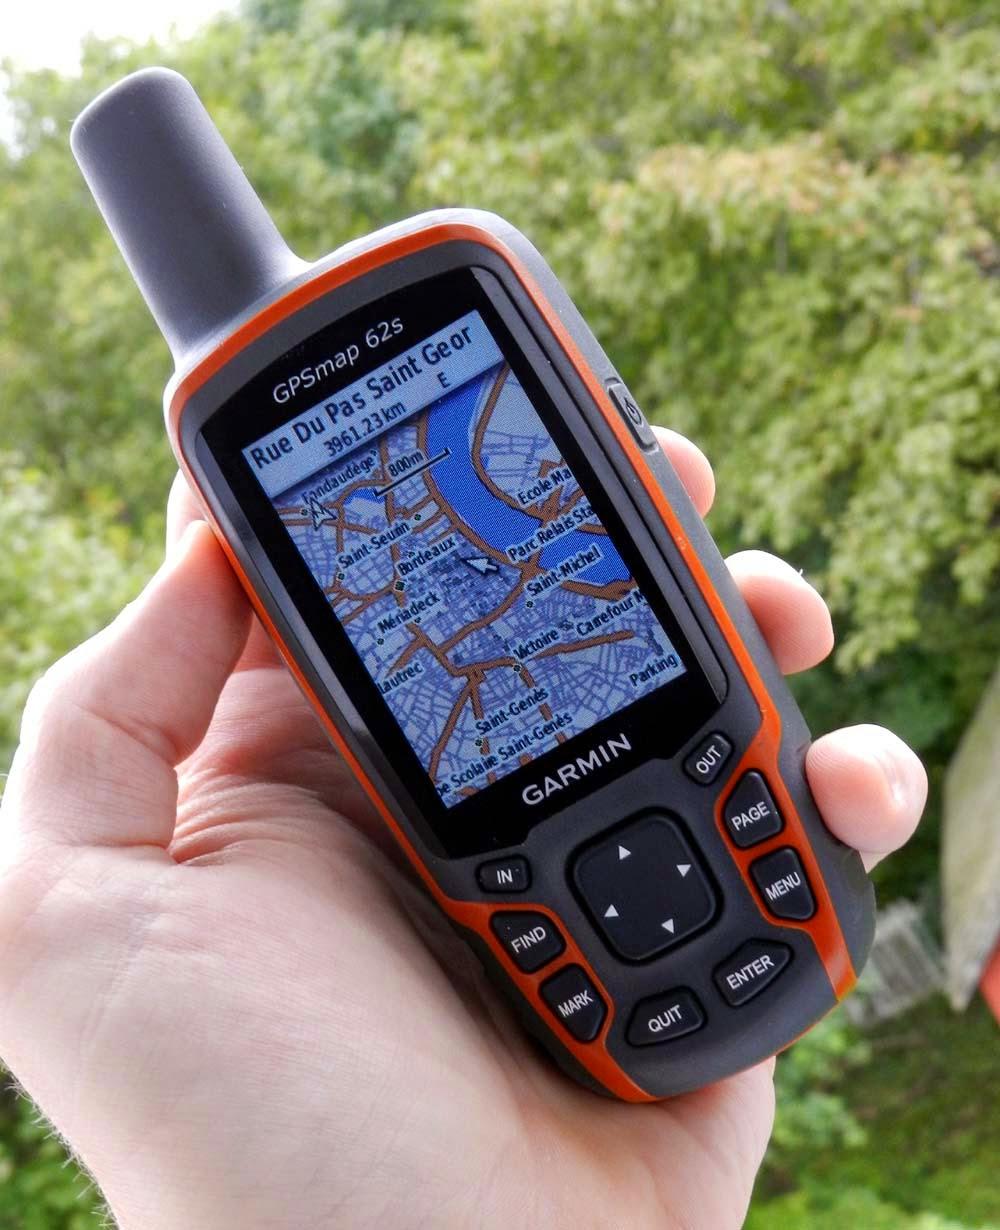 garmin 62s user manual browse manual guides u2022 rh trufflefries co Garmin GPSMAP 62s Handheld GPS Receiver Garmin 62s Maps